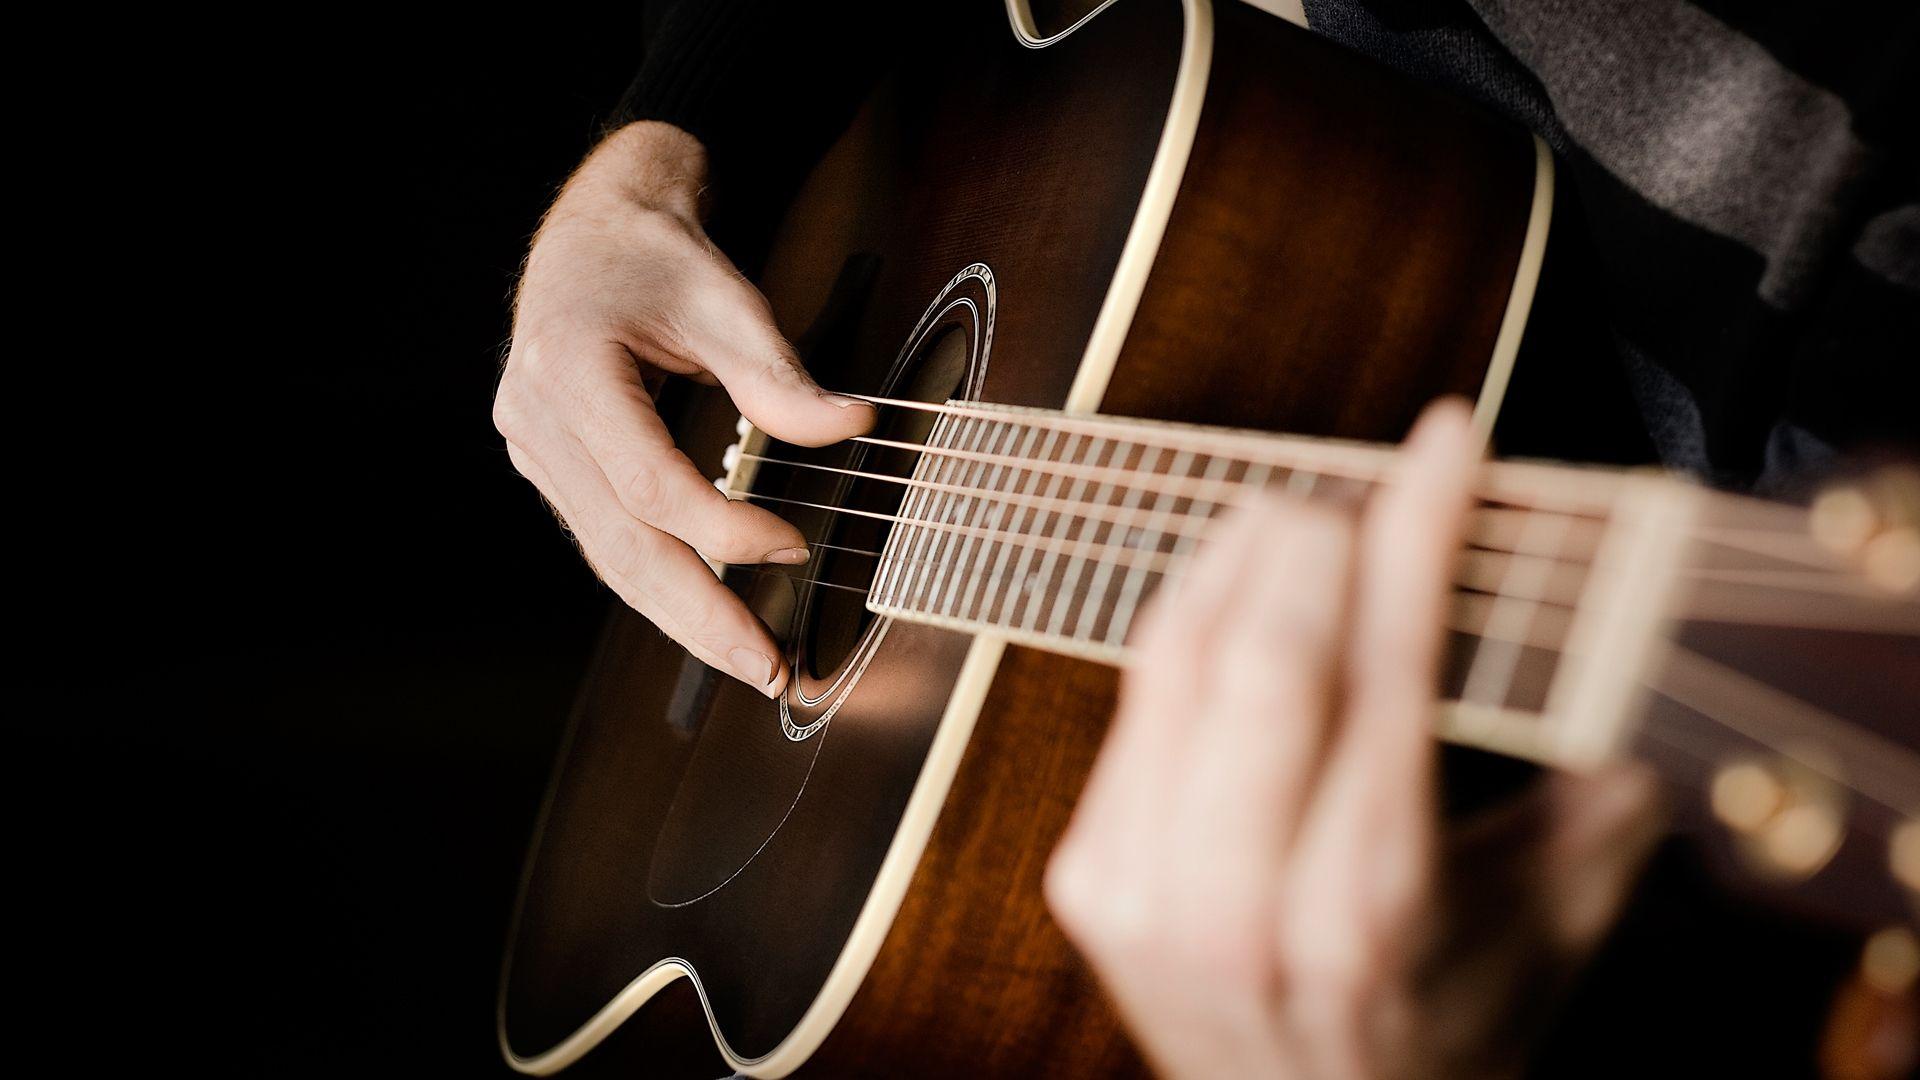 Acoustic Guitar hands, Image